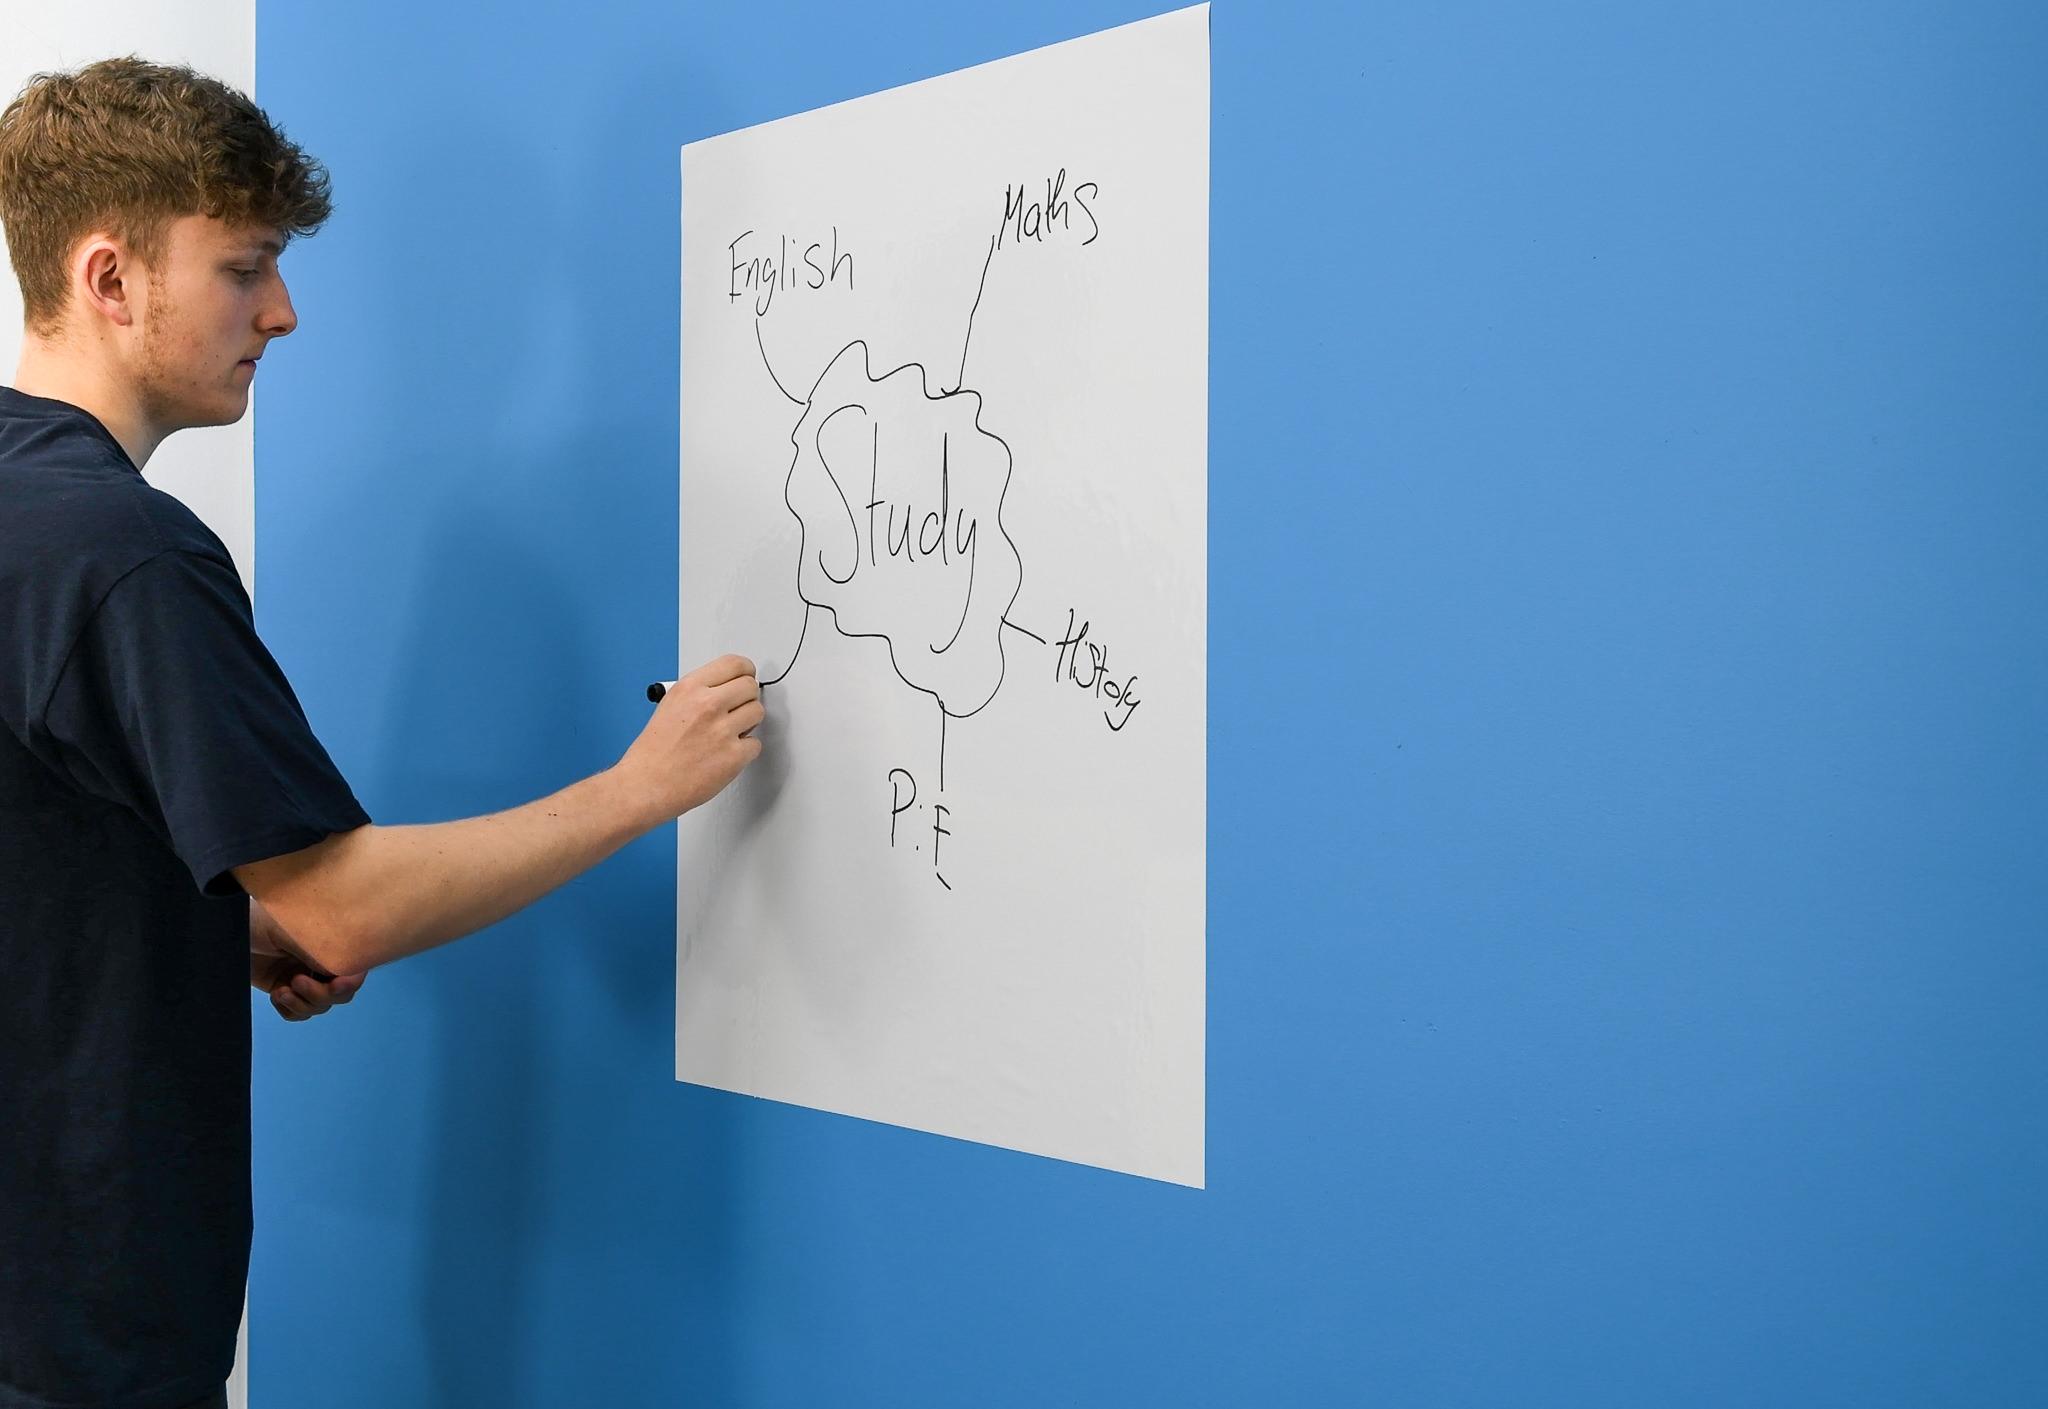 A1 Magic Whiteboard on wall